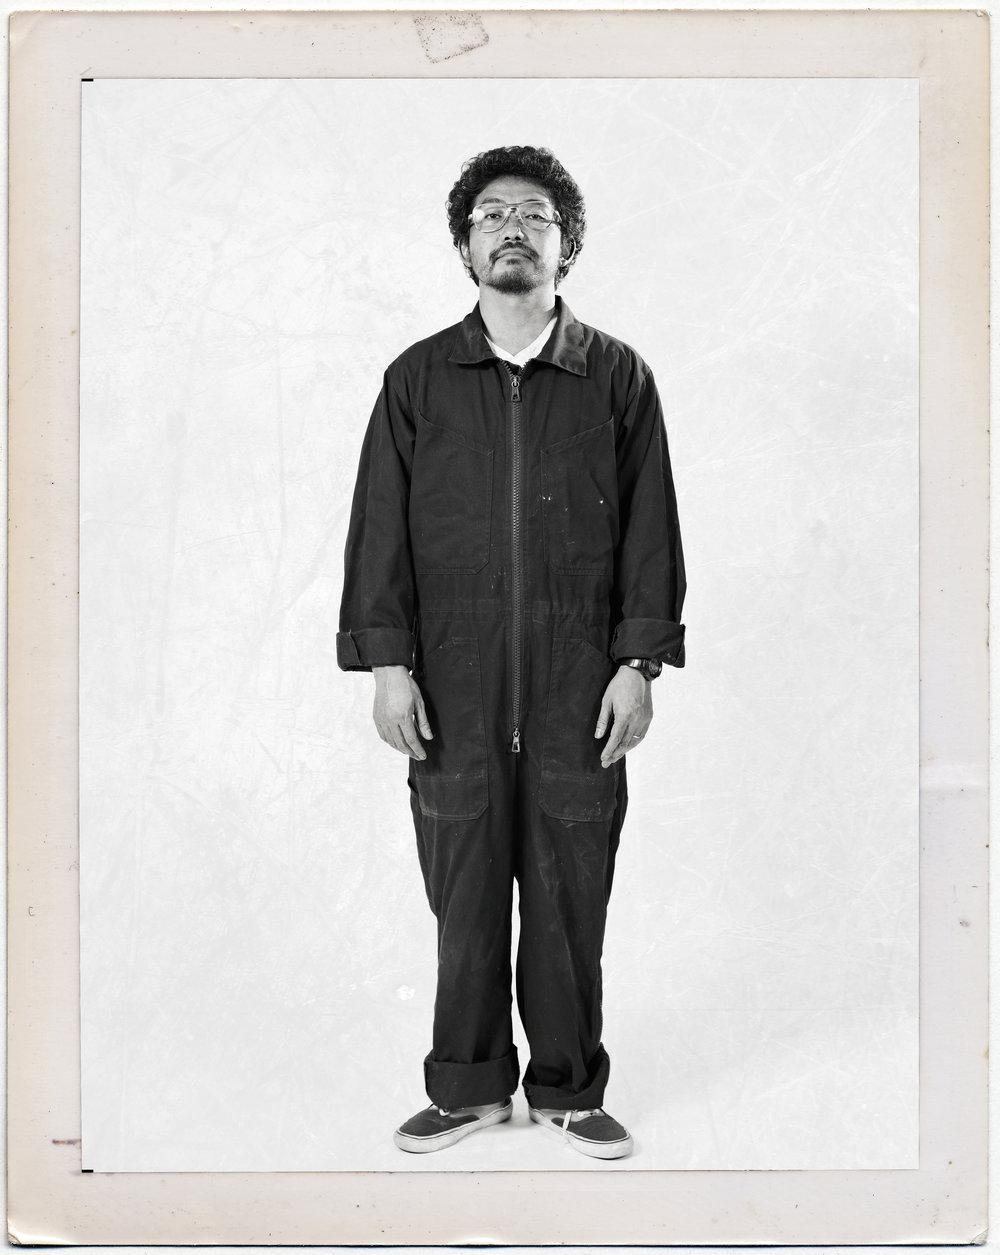 polaroid police man.jpg